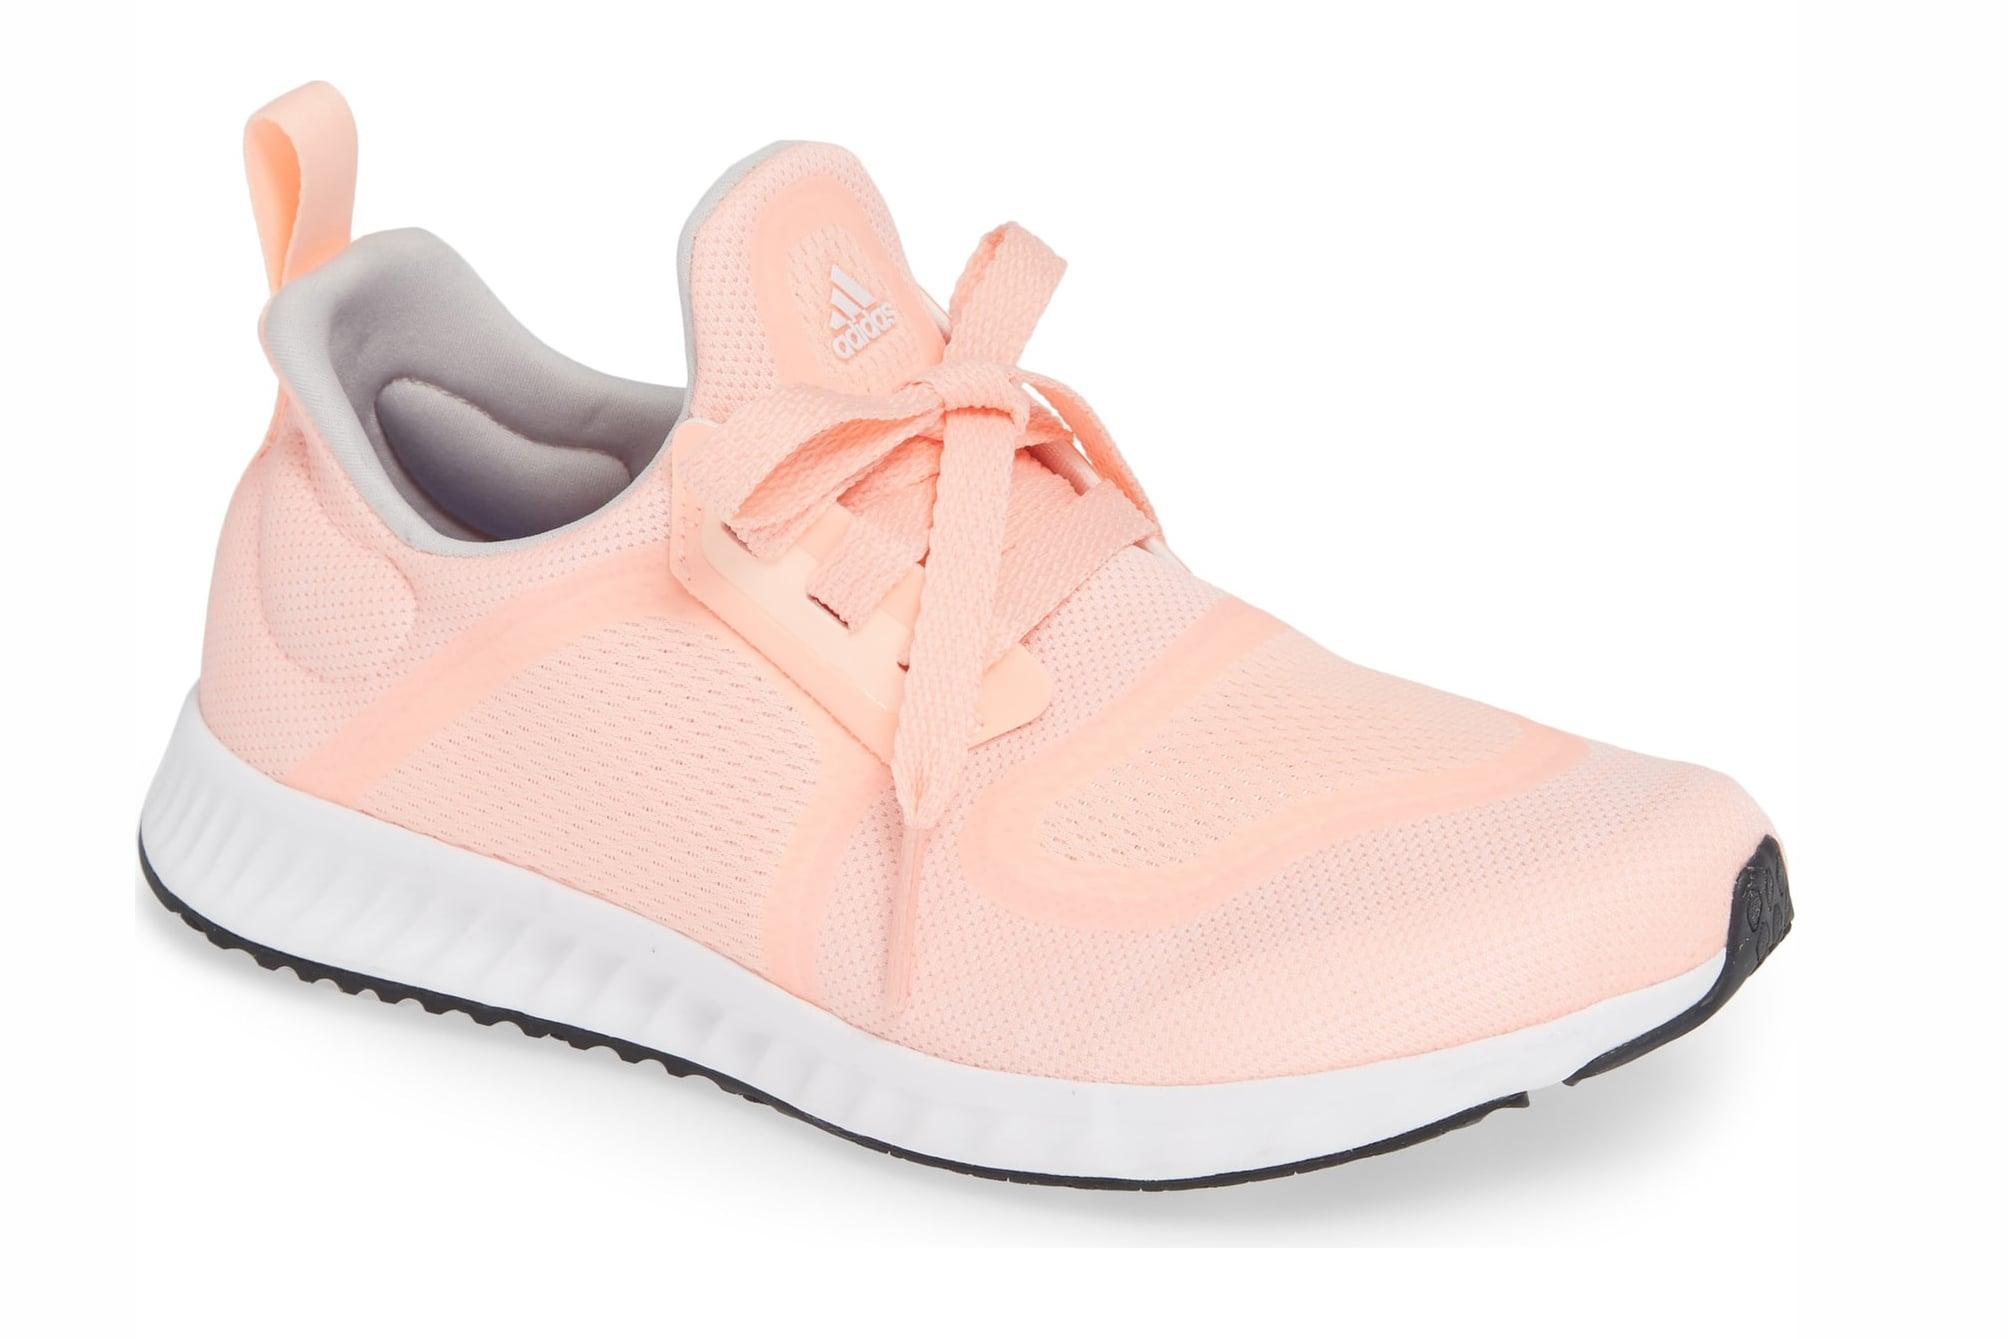 nordstrom anniversario vendita adidas scarpe 2018 popsugar fitness